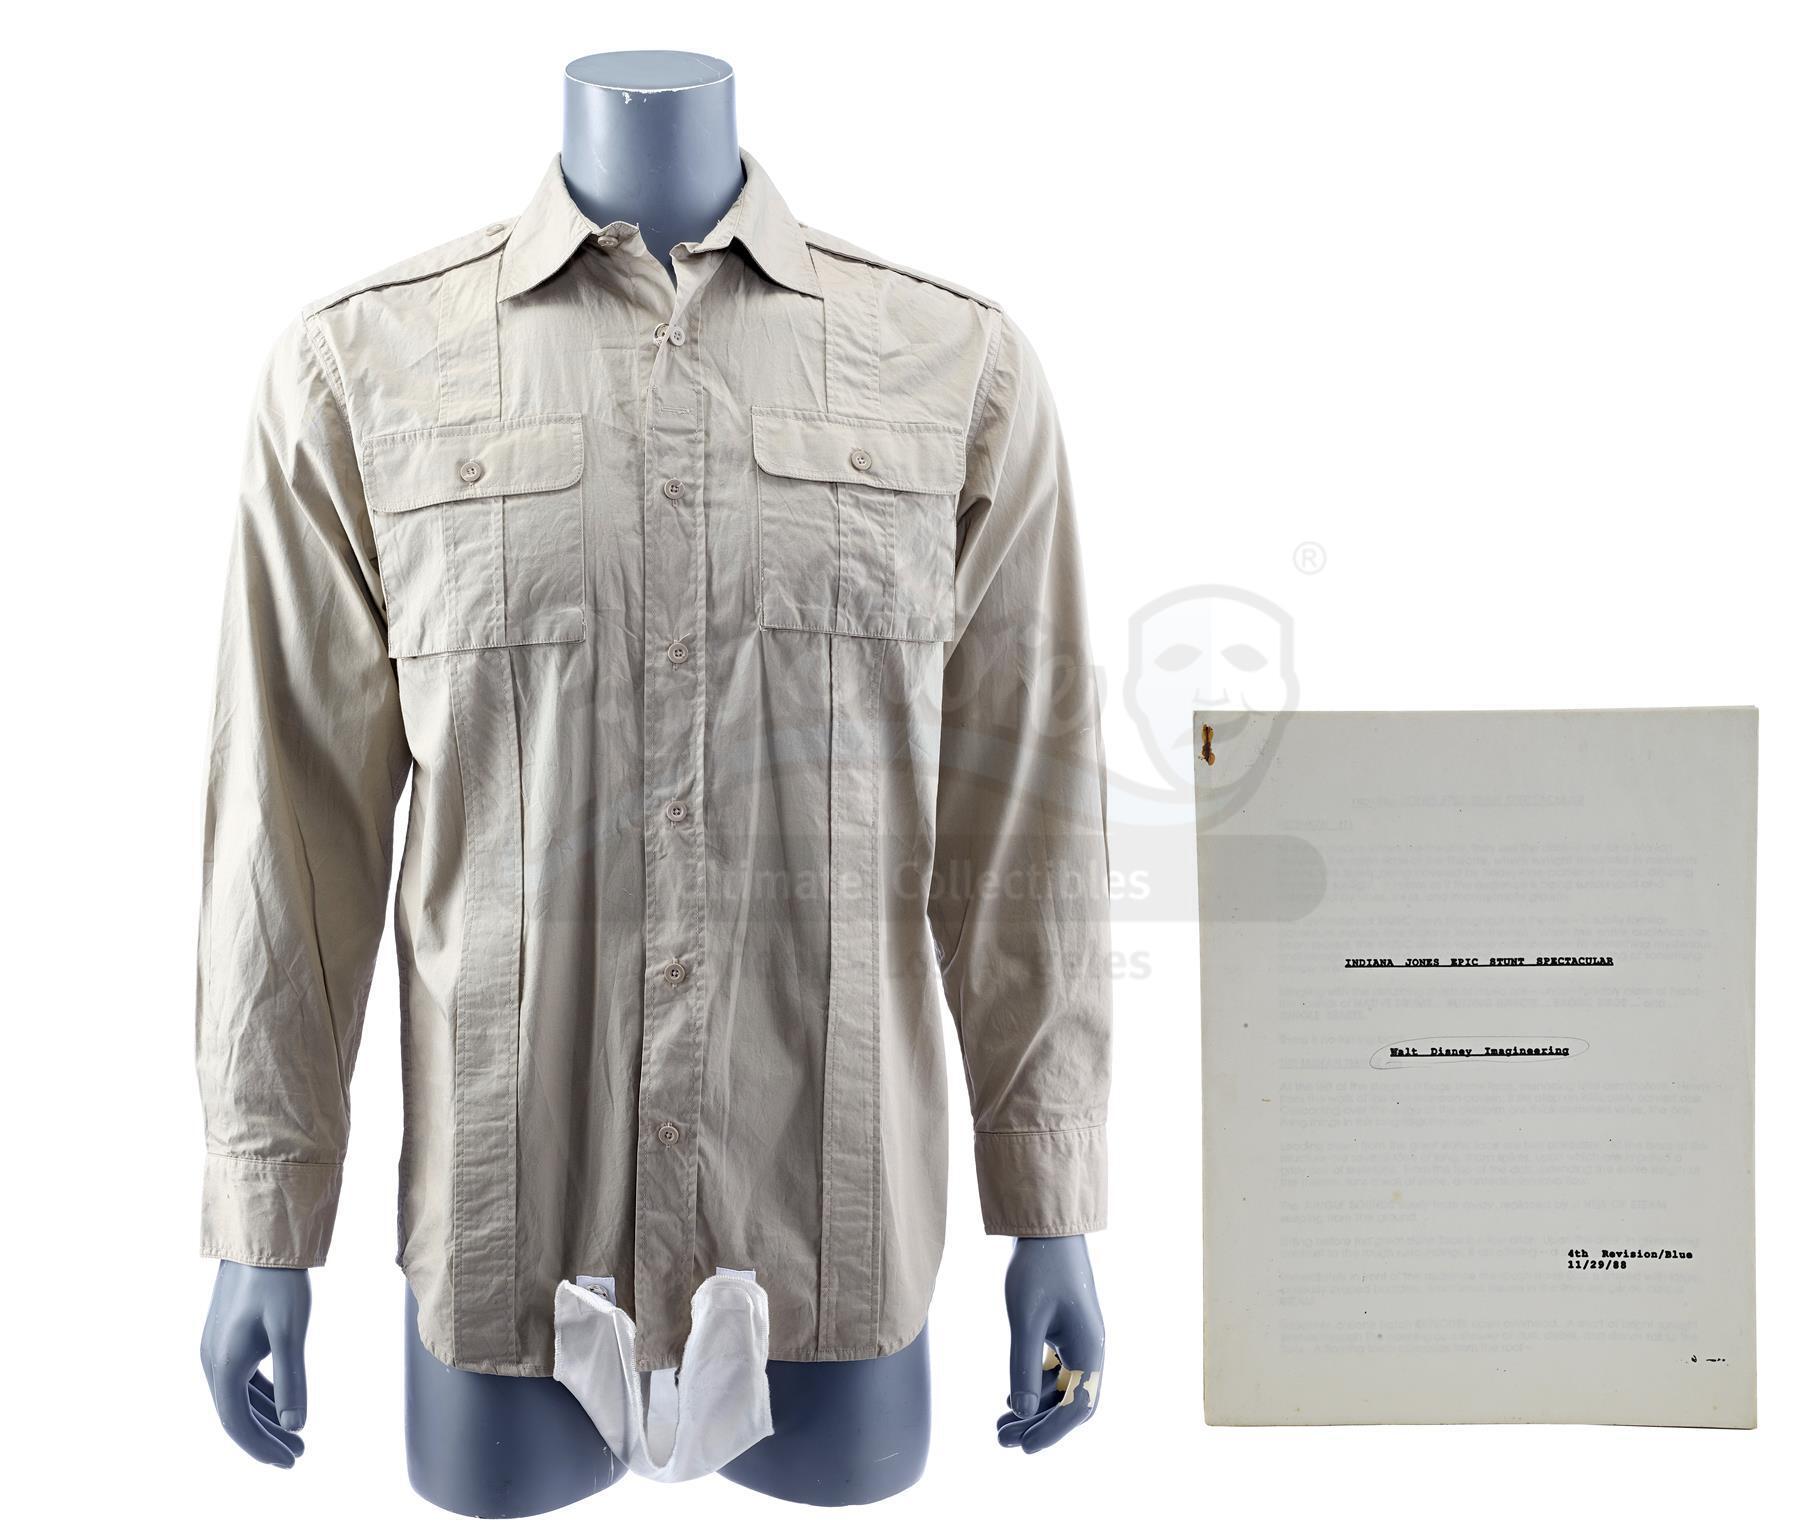 Lot # 785: INDIANA JONES EPIC STUNT SPECTACULAR! - Indiana Jones Shirt and Script